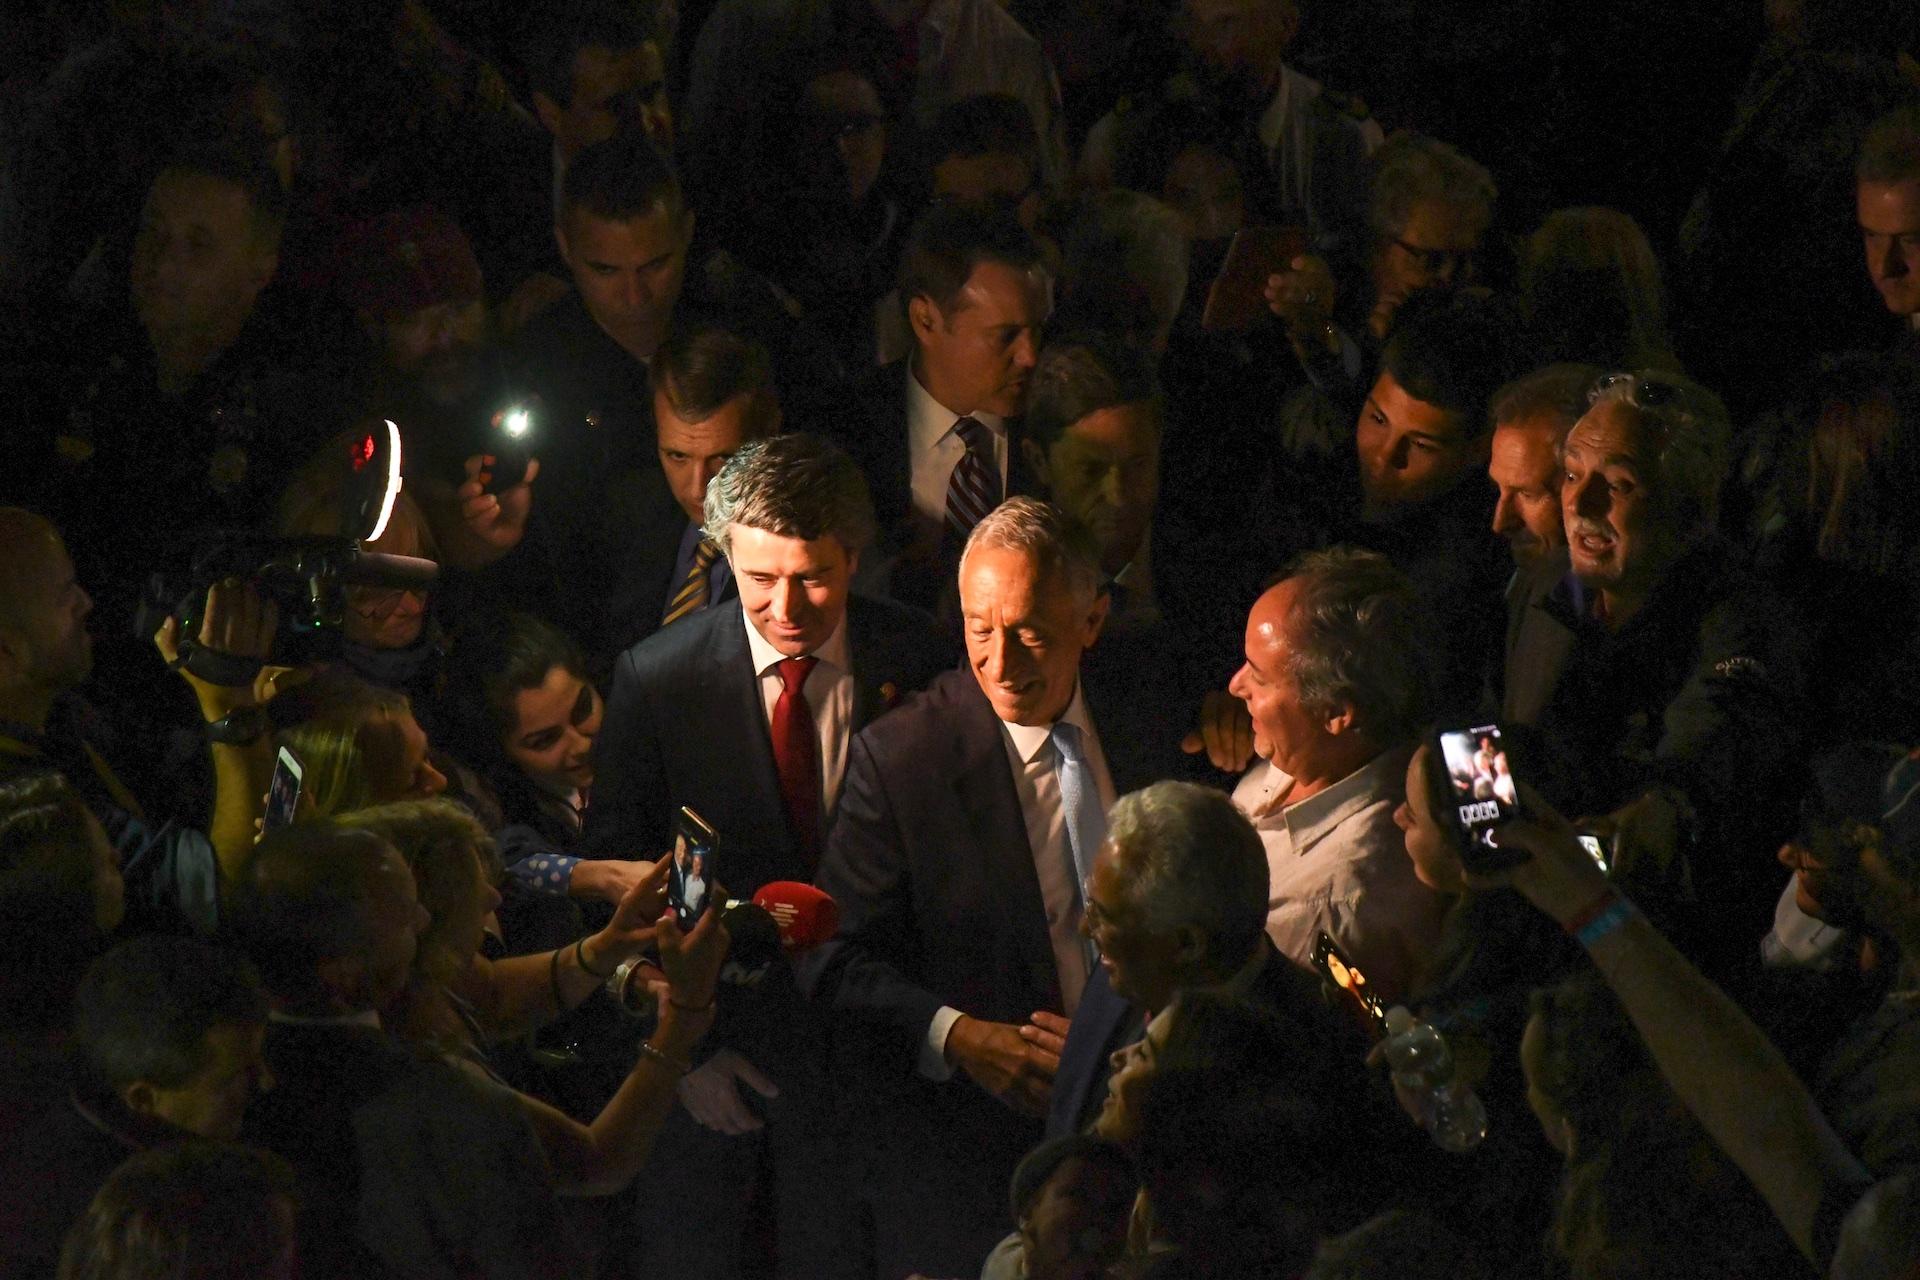 portuguese-president-marcelo-rebelo-de-sousa-greeting-members-of-the-crowd_41893860335_o